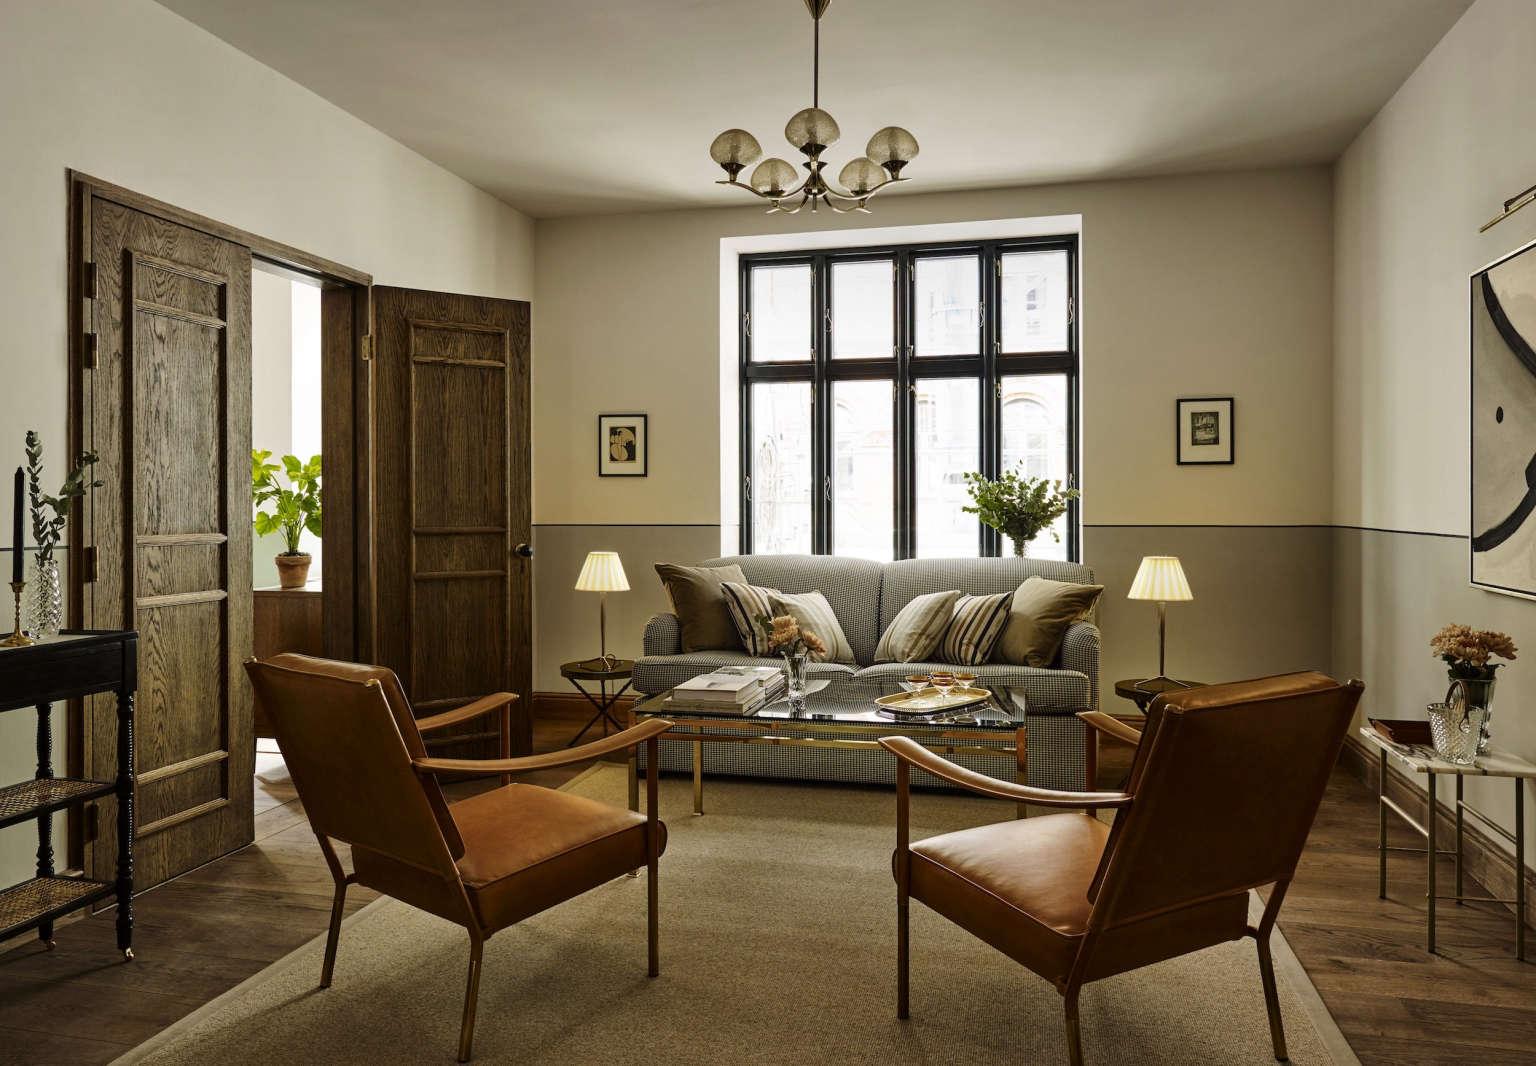 Hotel Stay Kopenhagen : Excellent for long term stay in copenhagen review of adina